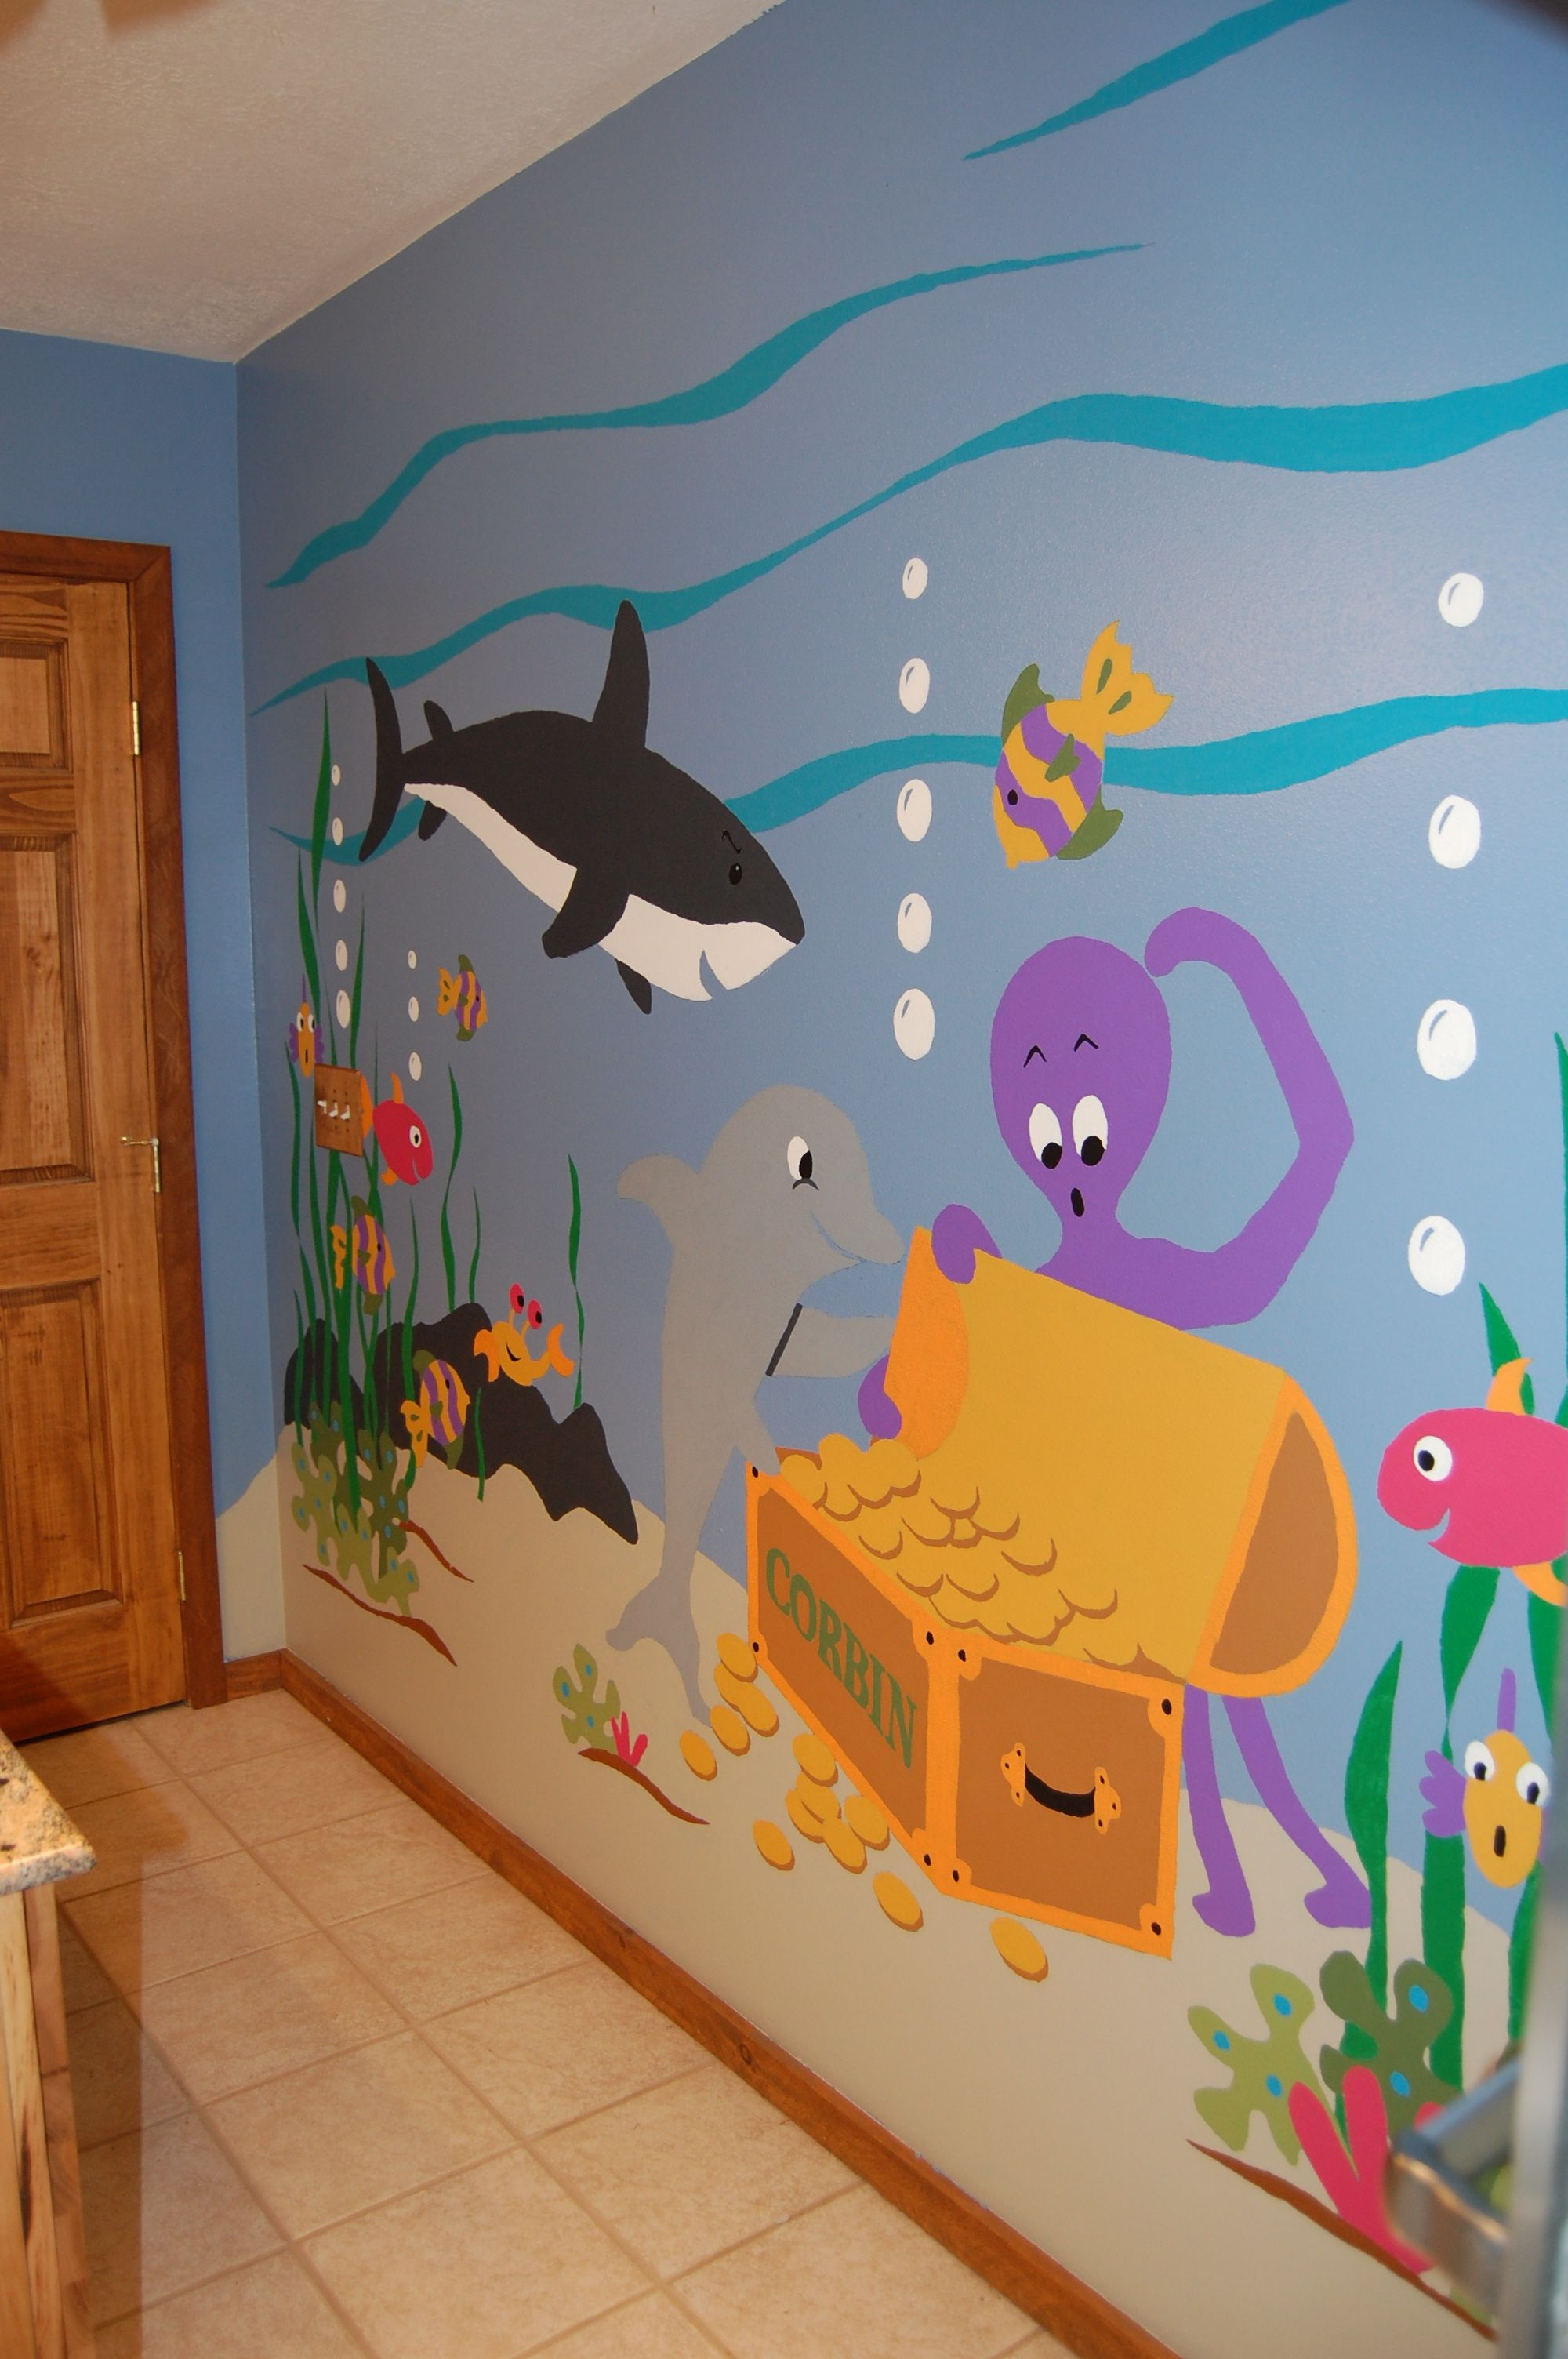 Sea treasures wall mural kinderzimmer wandgestaltung for Wandgestaltung kinderzimmer